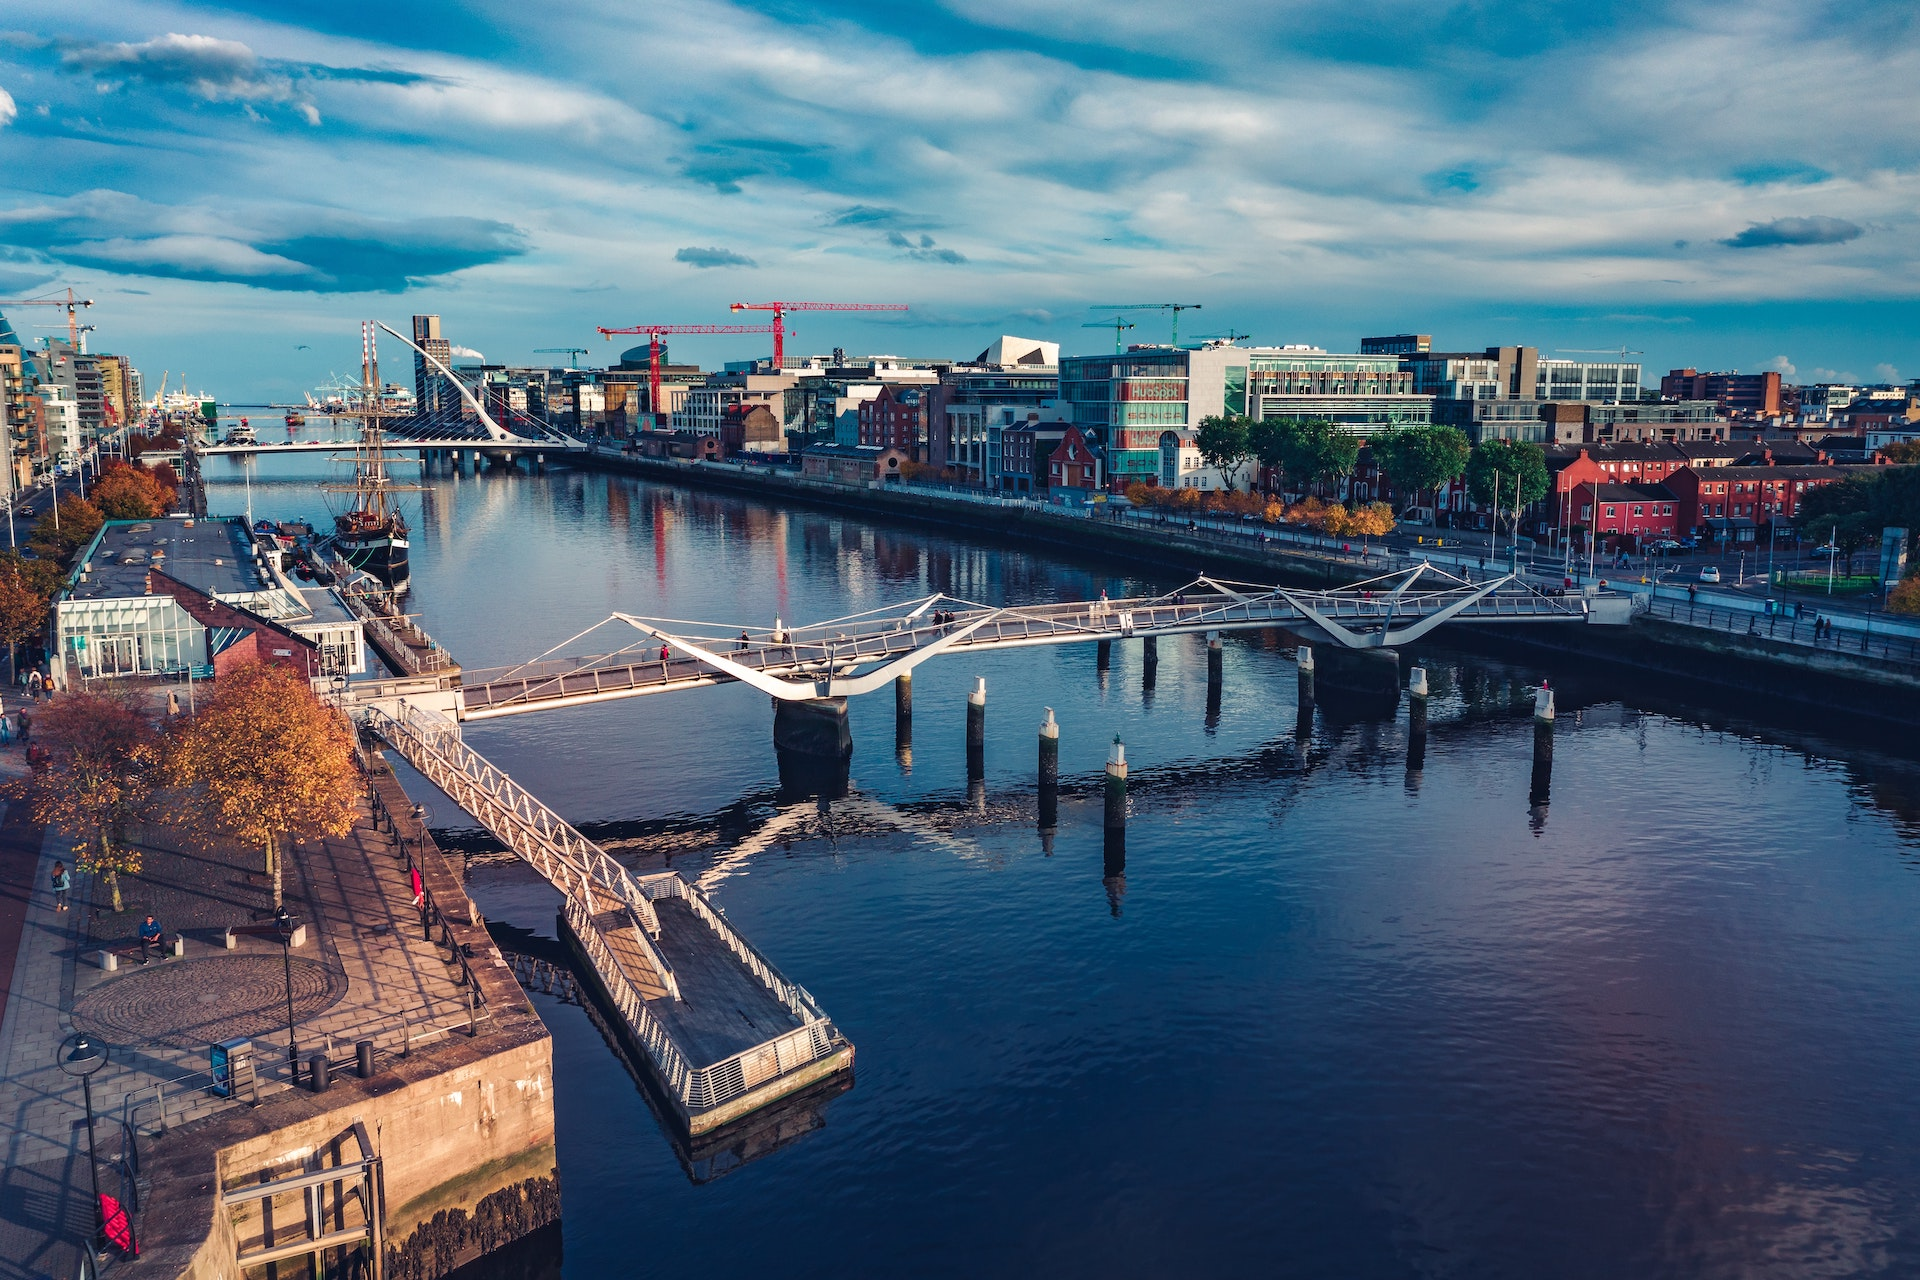 Photo: Dublin, Ireland | Credit: Lucian Potlog, YFS Magazine, Pexels